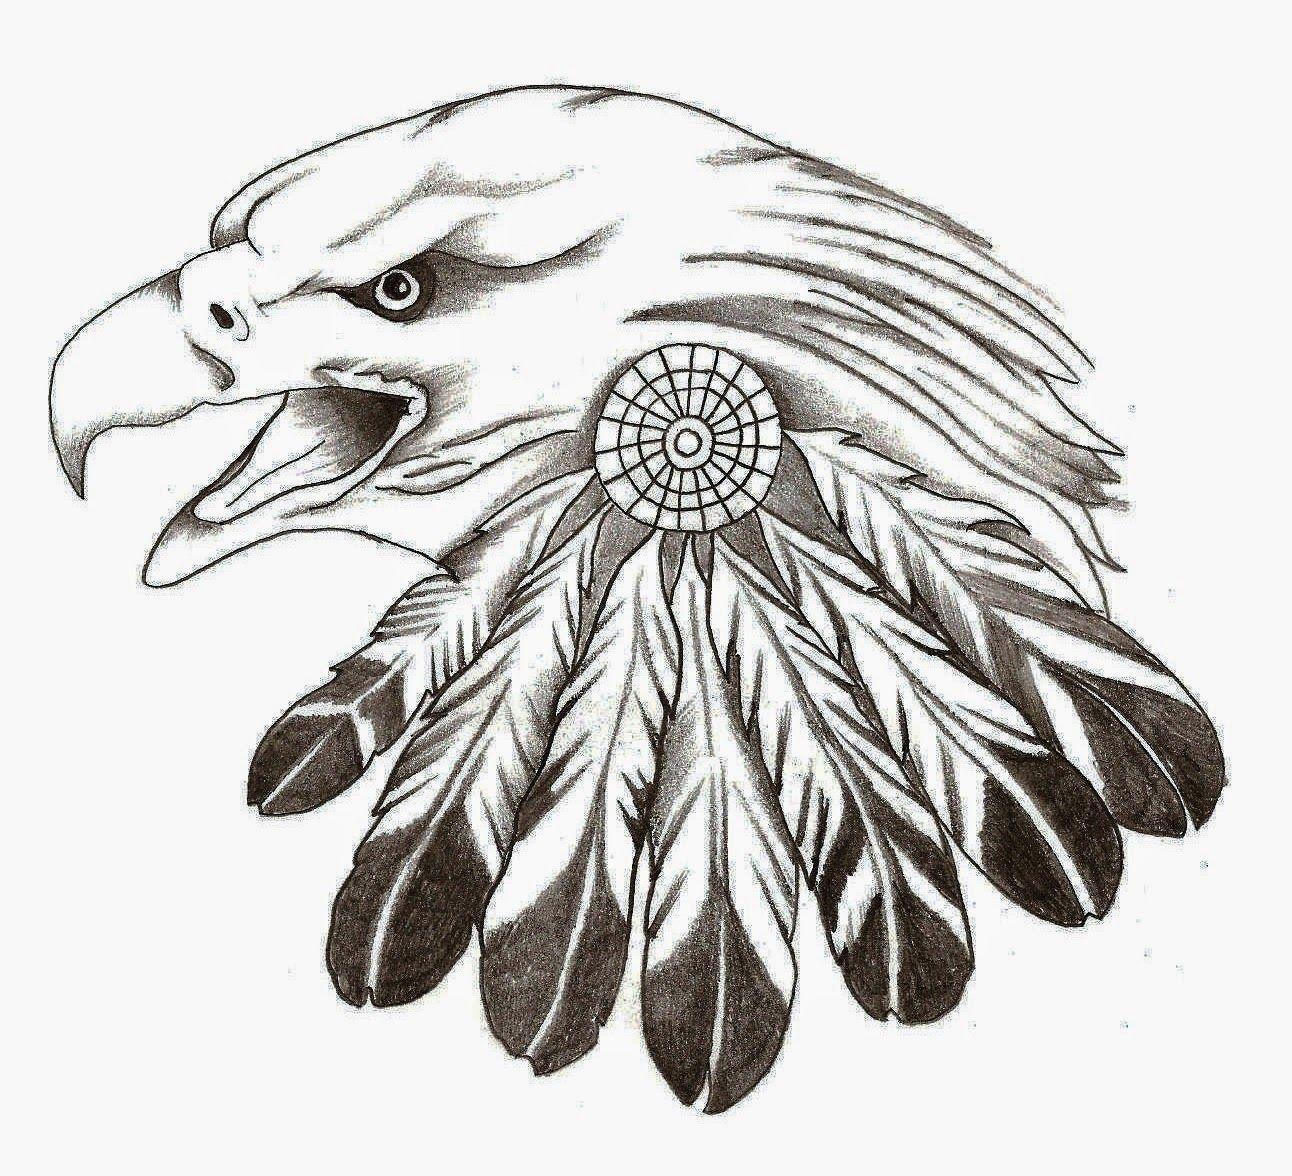 Stencil Indian Feather Craft | Eagle Tattoo Stencil